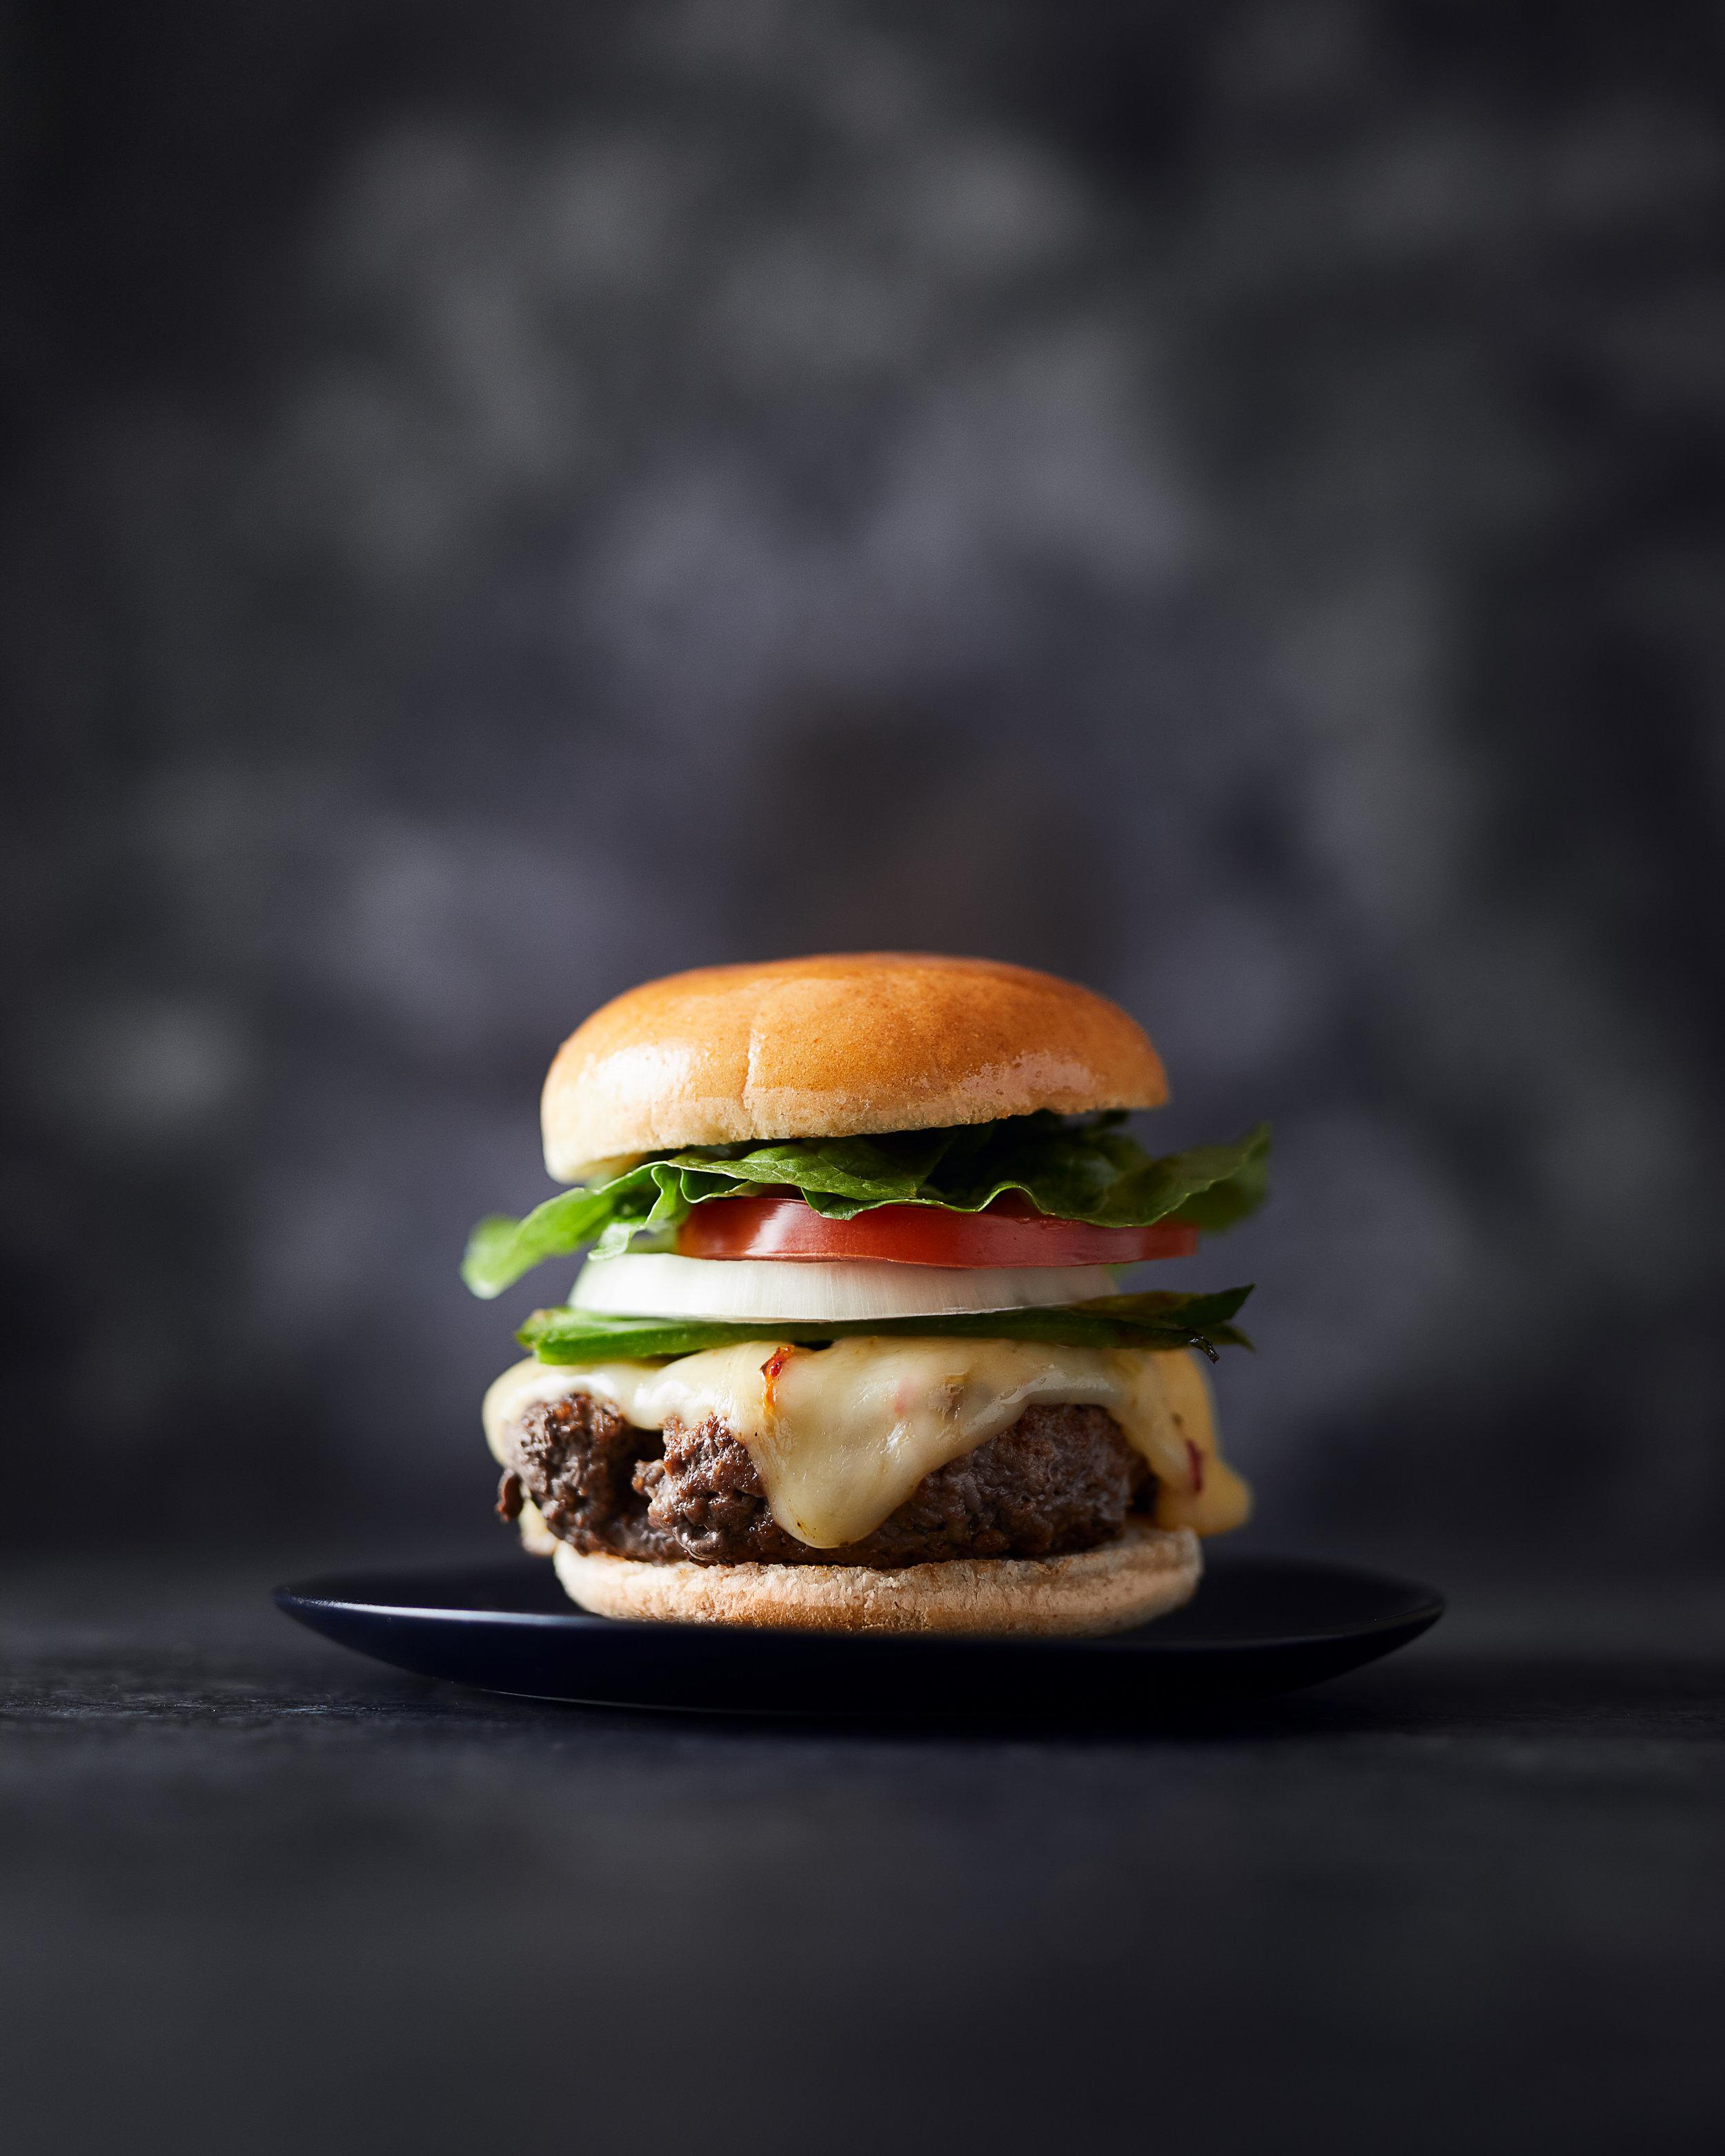 Halal-Burger-Los-Angeles-Food-Photographer-Brandon-Figueroa 1.jpg